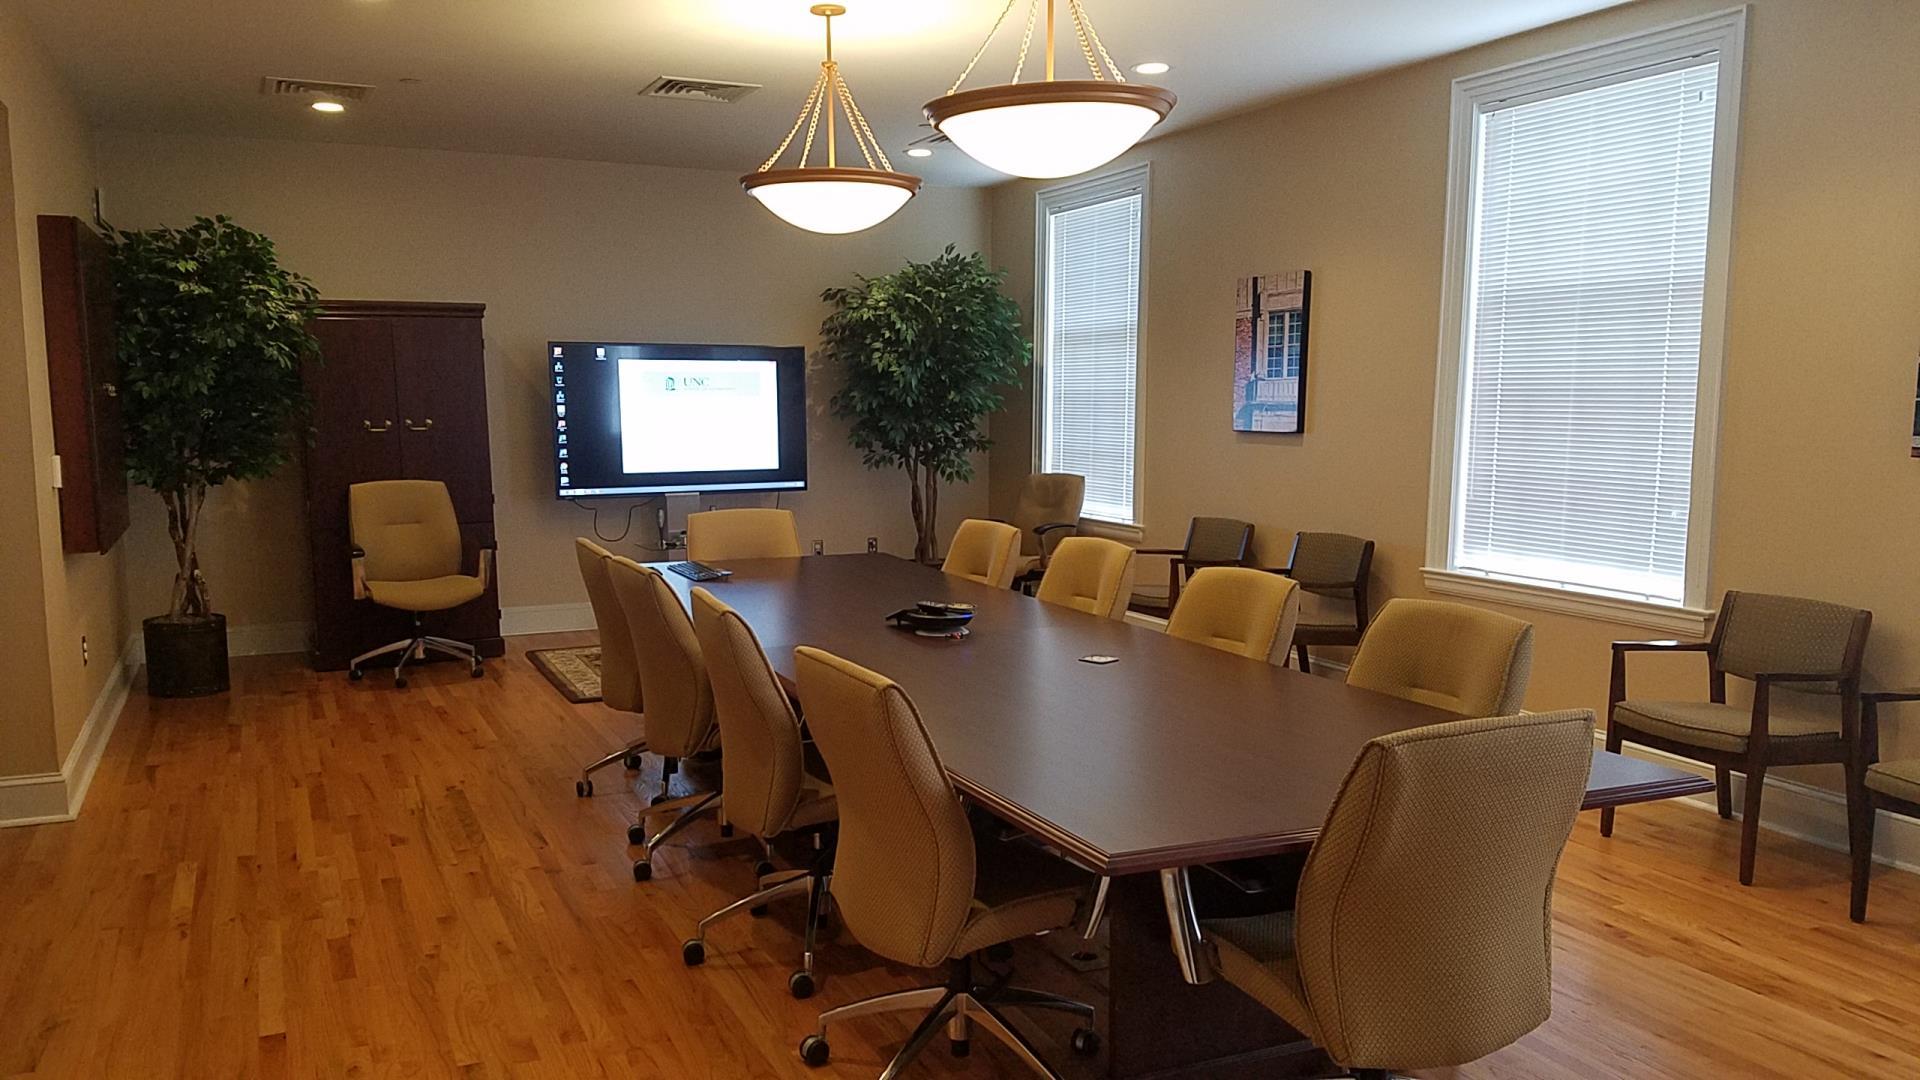 City Hall - Executive Conference Room - Room 106 | Facility ...